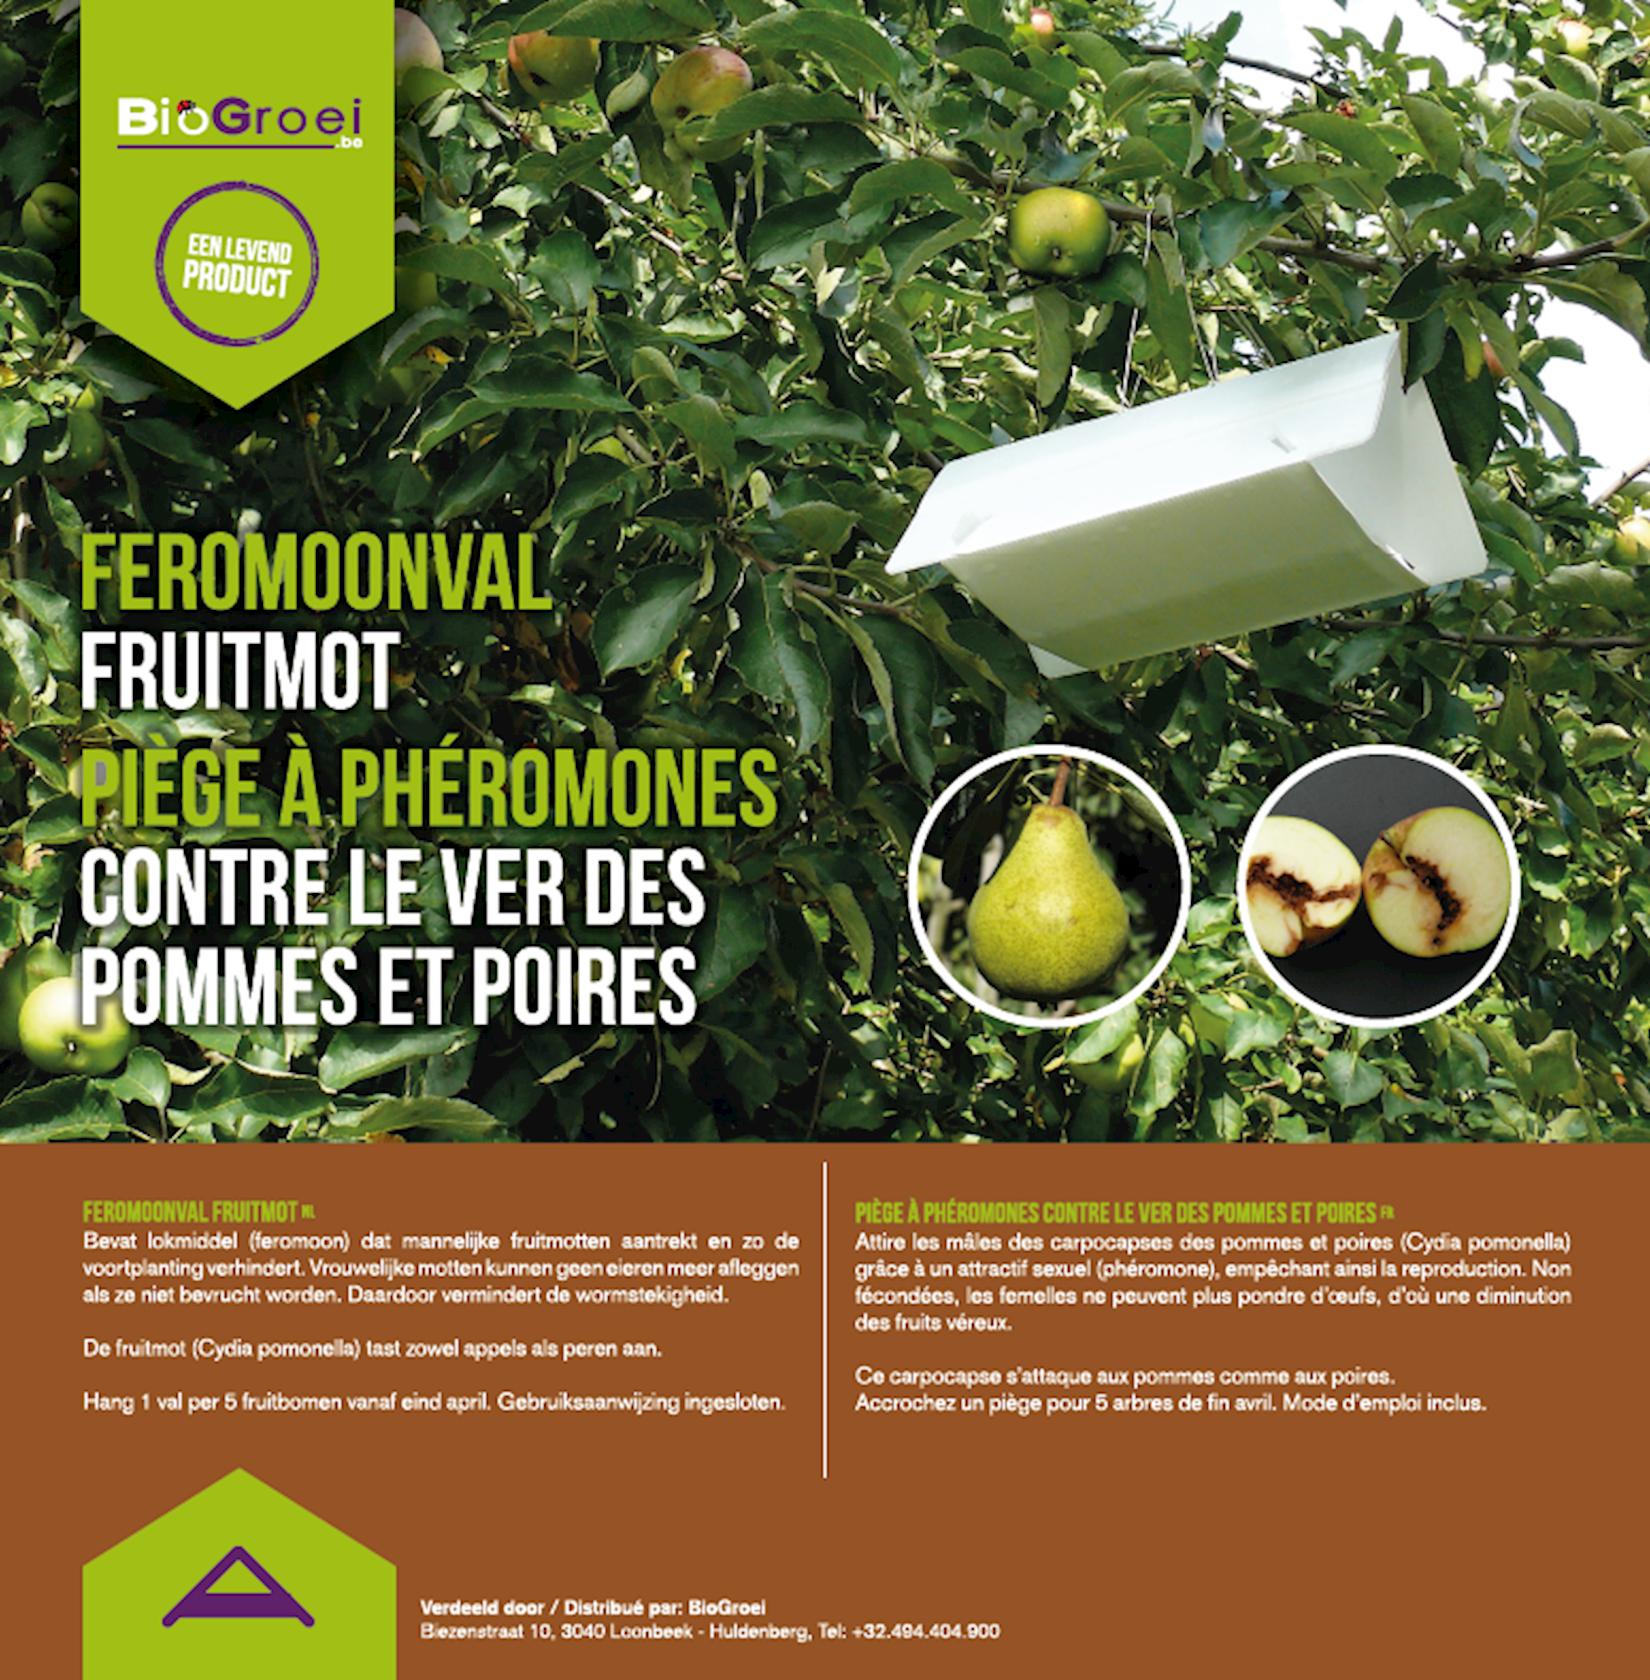 Feromoonval-fruitmot